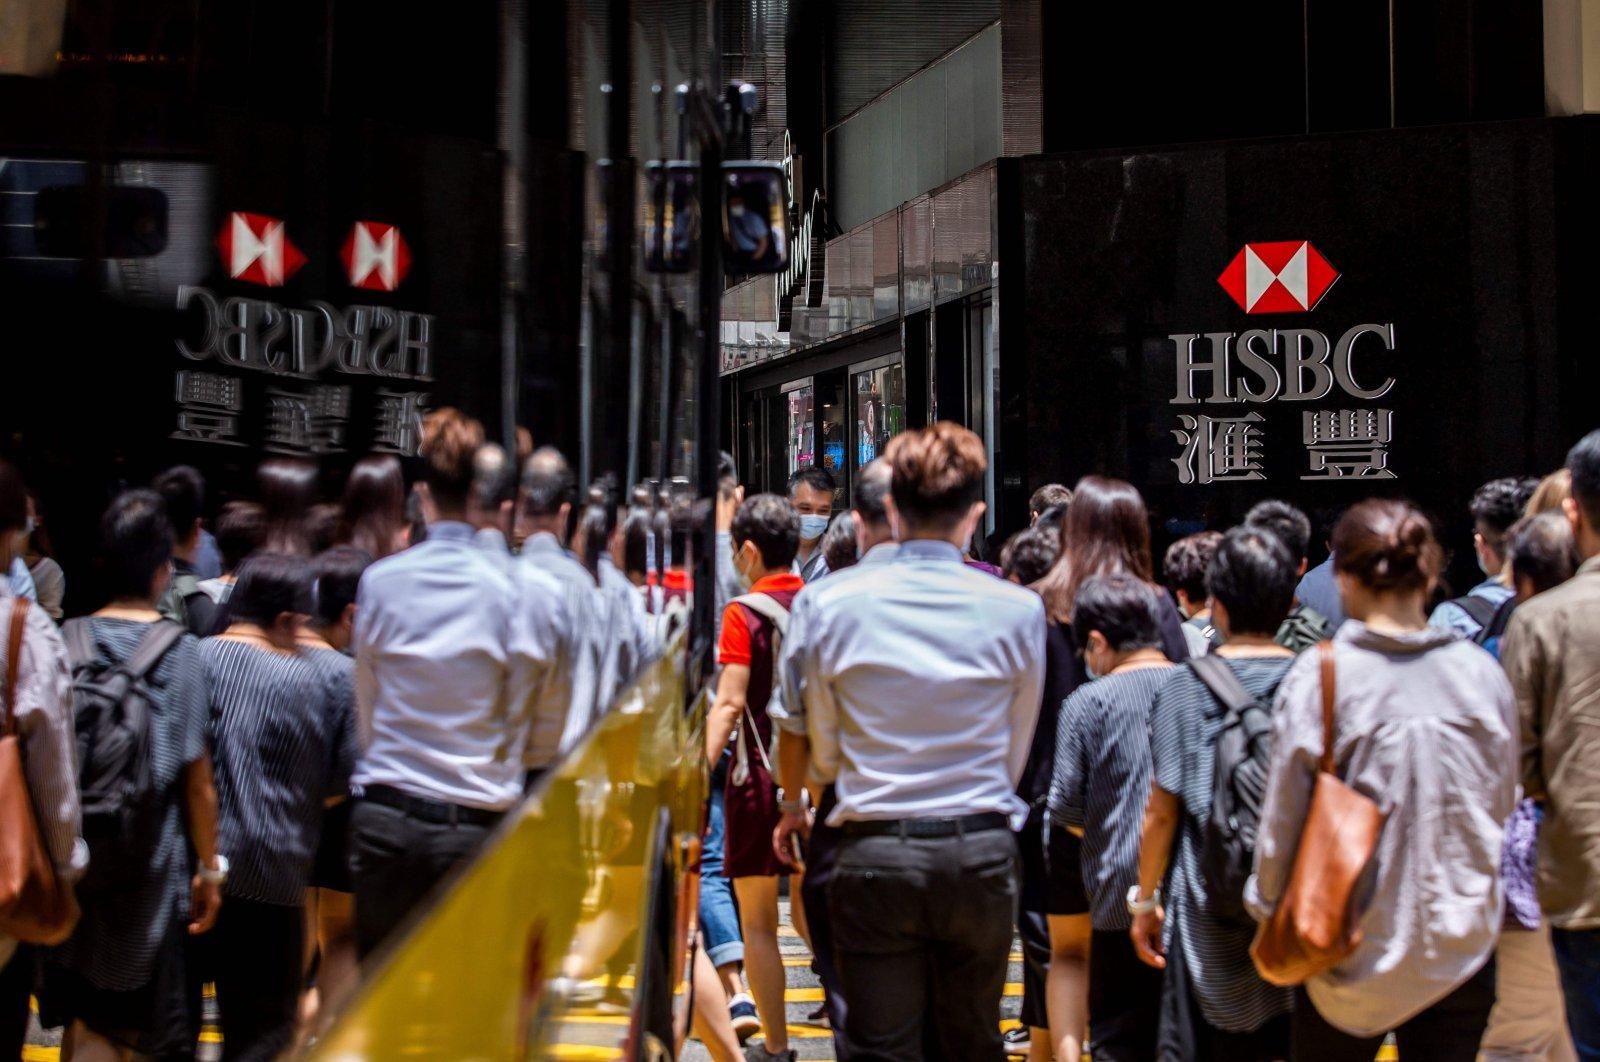 Pedestrians walk past the HSBC logo outside a local branch bank in Hong Kong, Aug. 2, 2021. (AFP Photo)